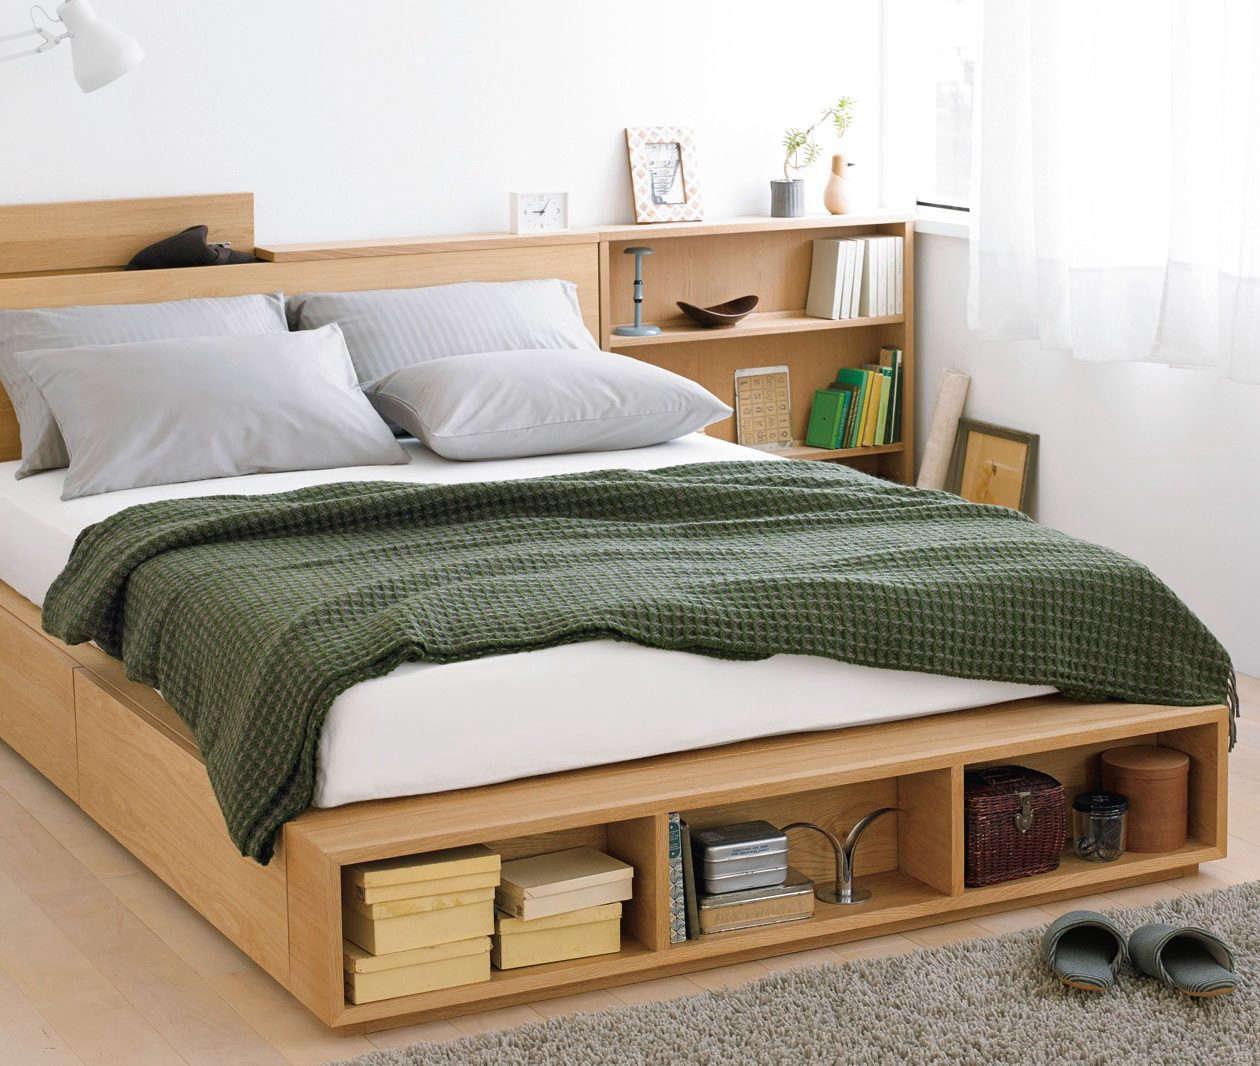 10 Easy Pieces Storage Beds Remodelista